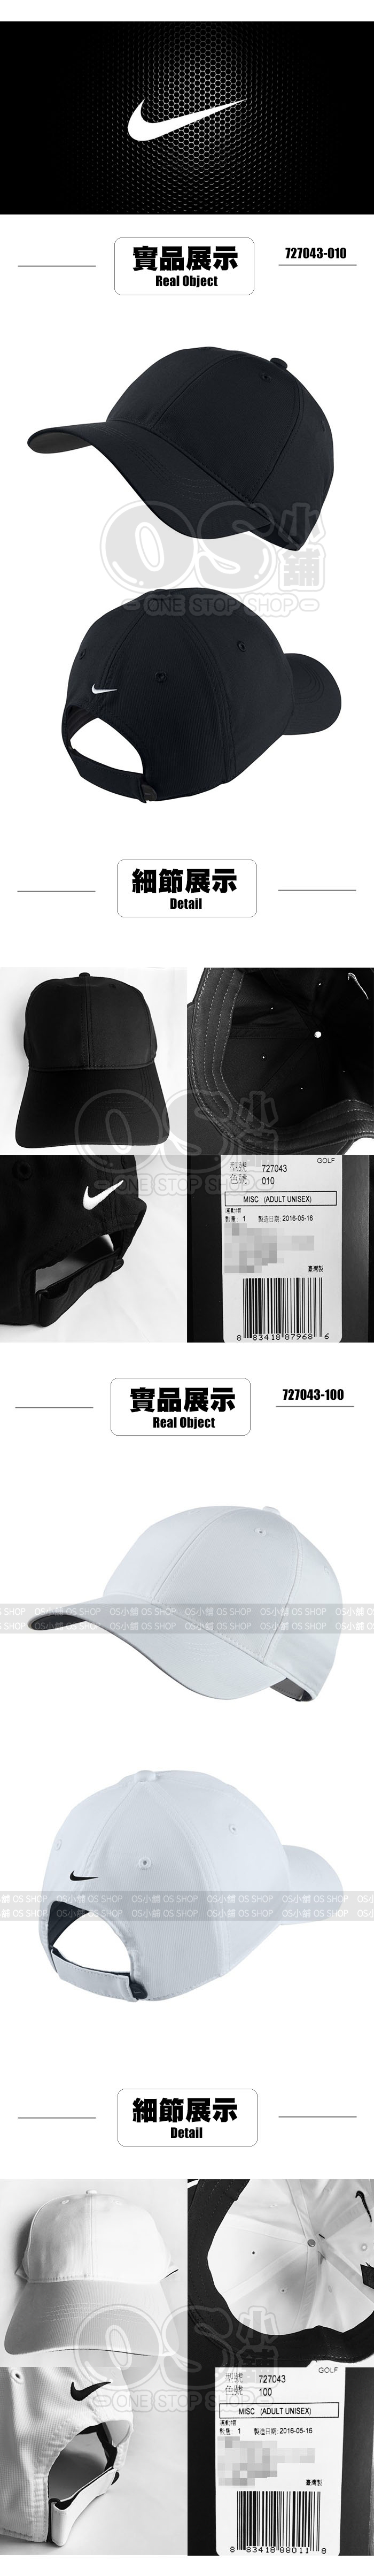 Nike 老帽727043-010黑色白勾100白色黑勾LEGACY91 CUSTOM TECH CAP ... 5b4f911ce8b6